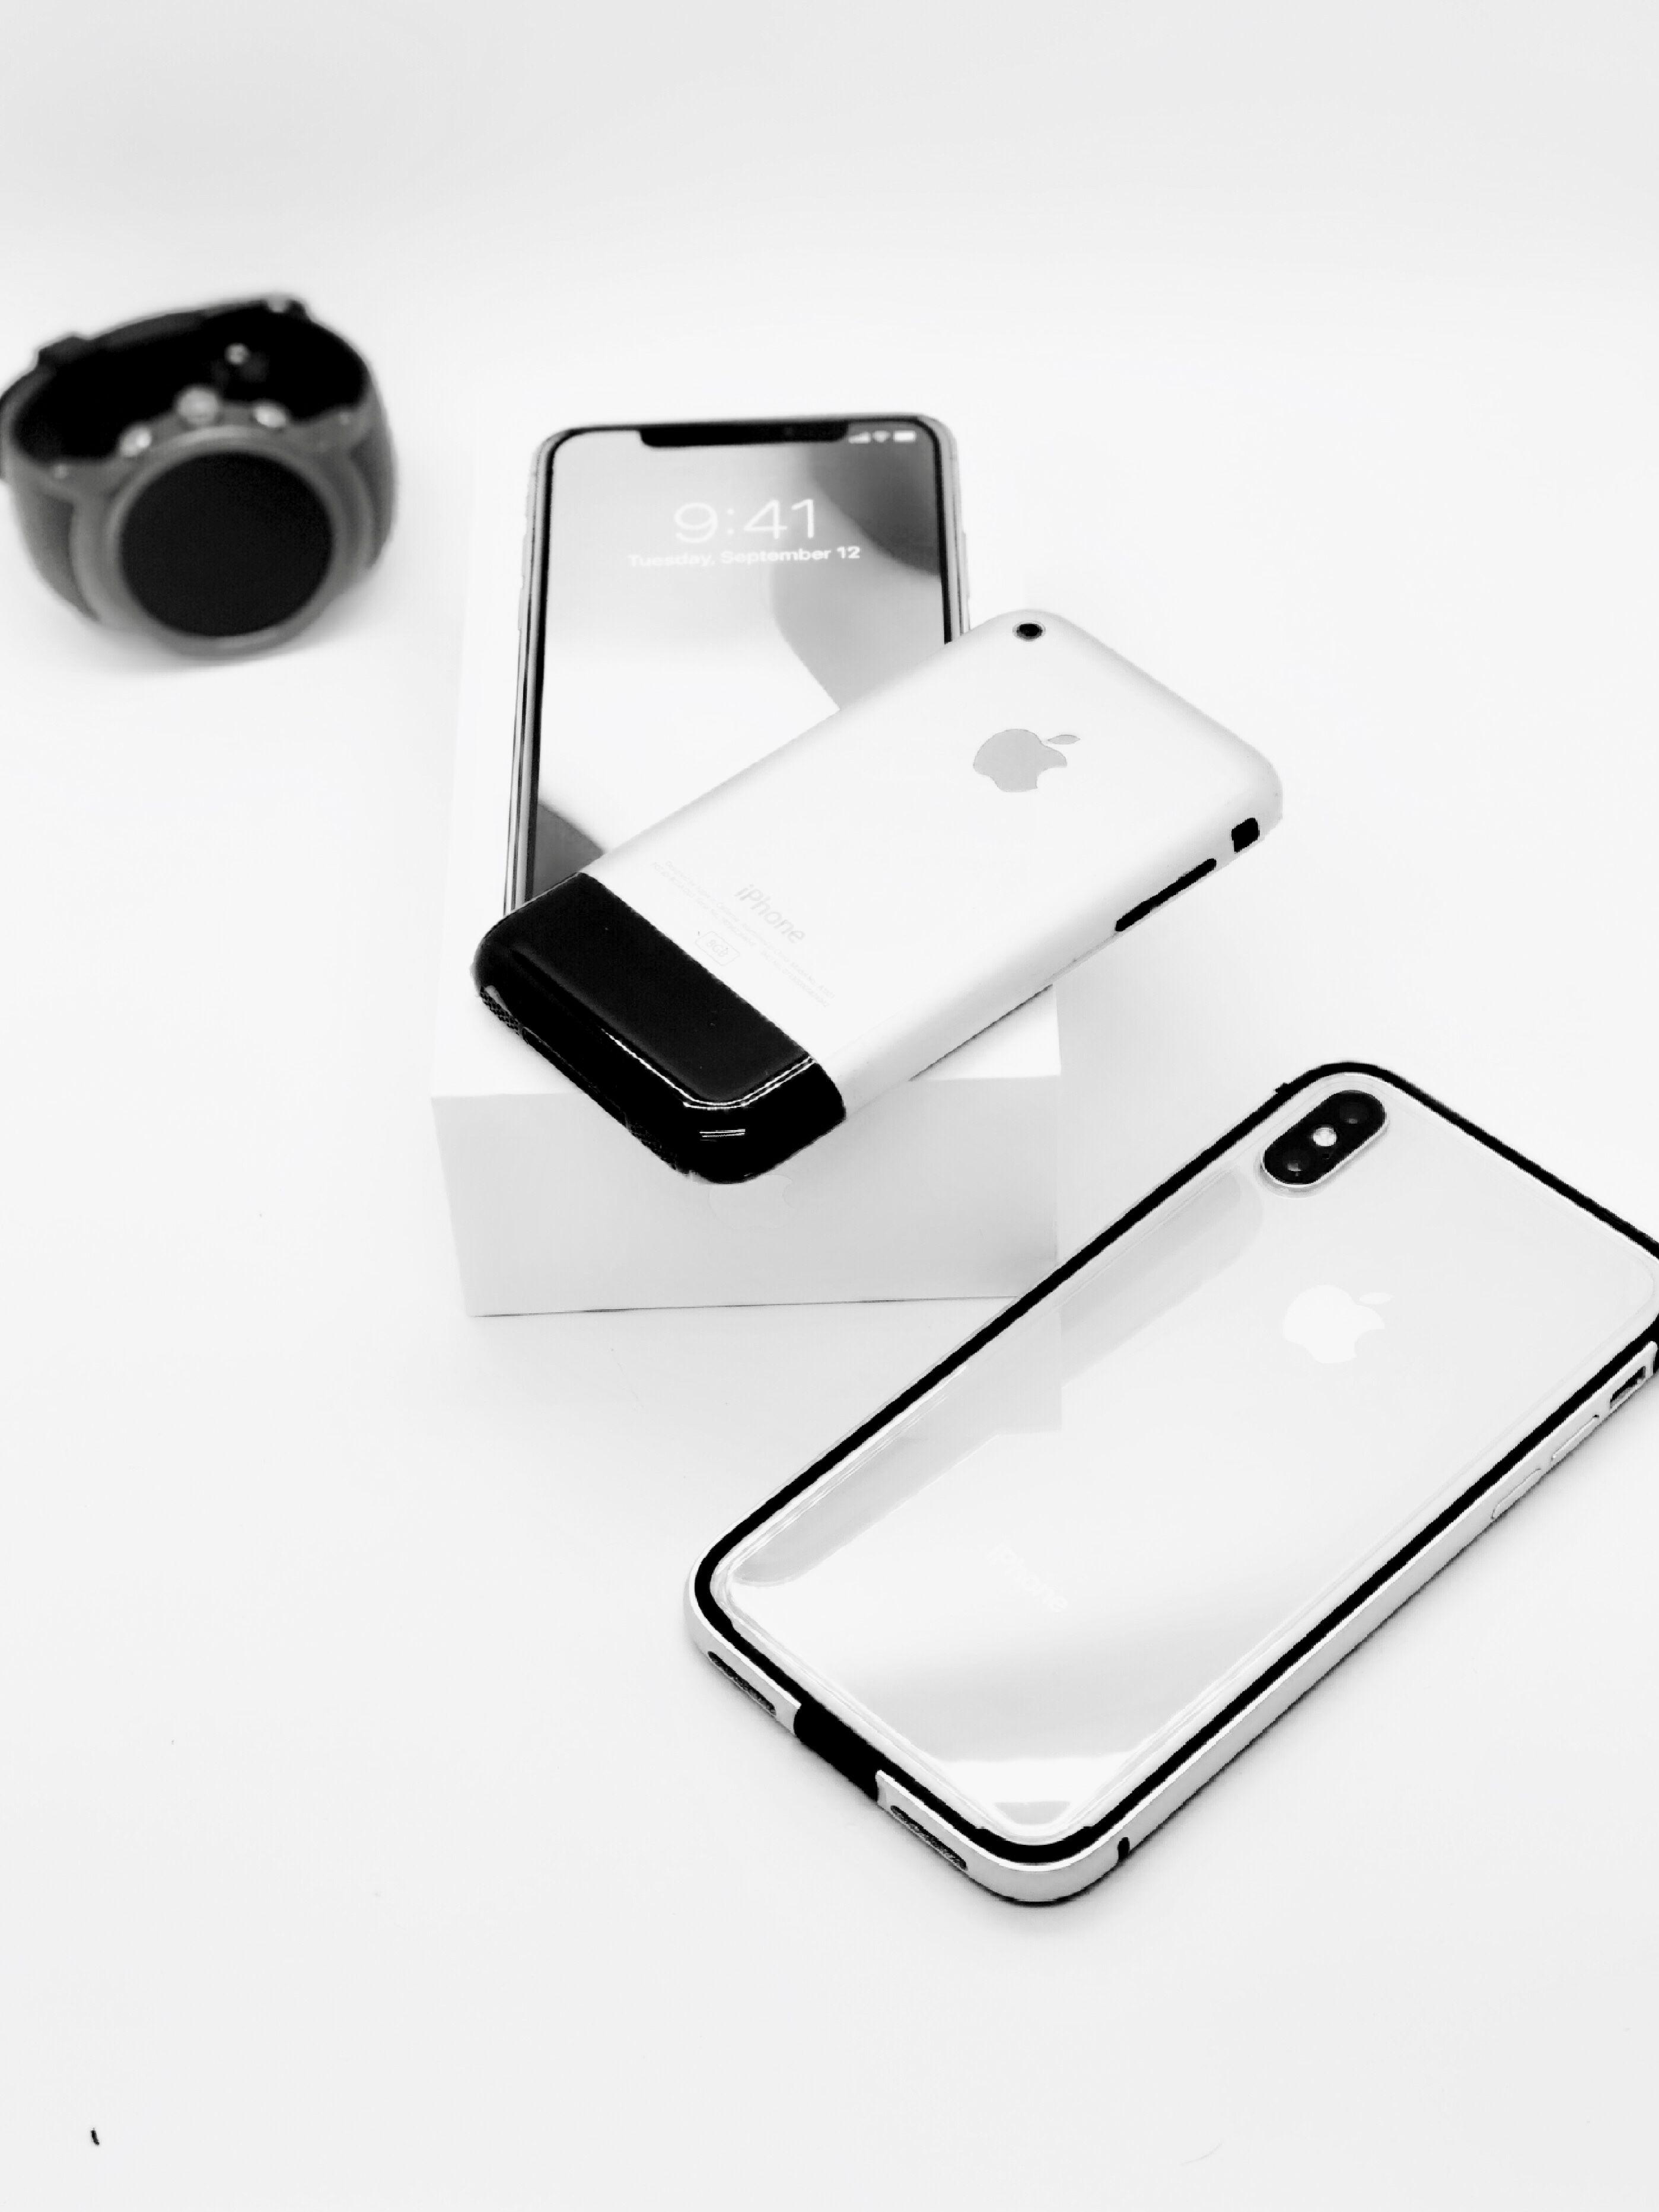 8e6ca2faacc Pin de Alessander Paredes (Alessander_Paredes) en Apple Inc   Iphone ...